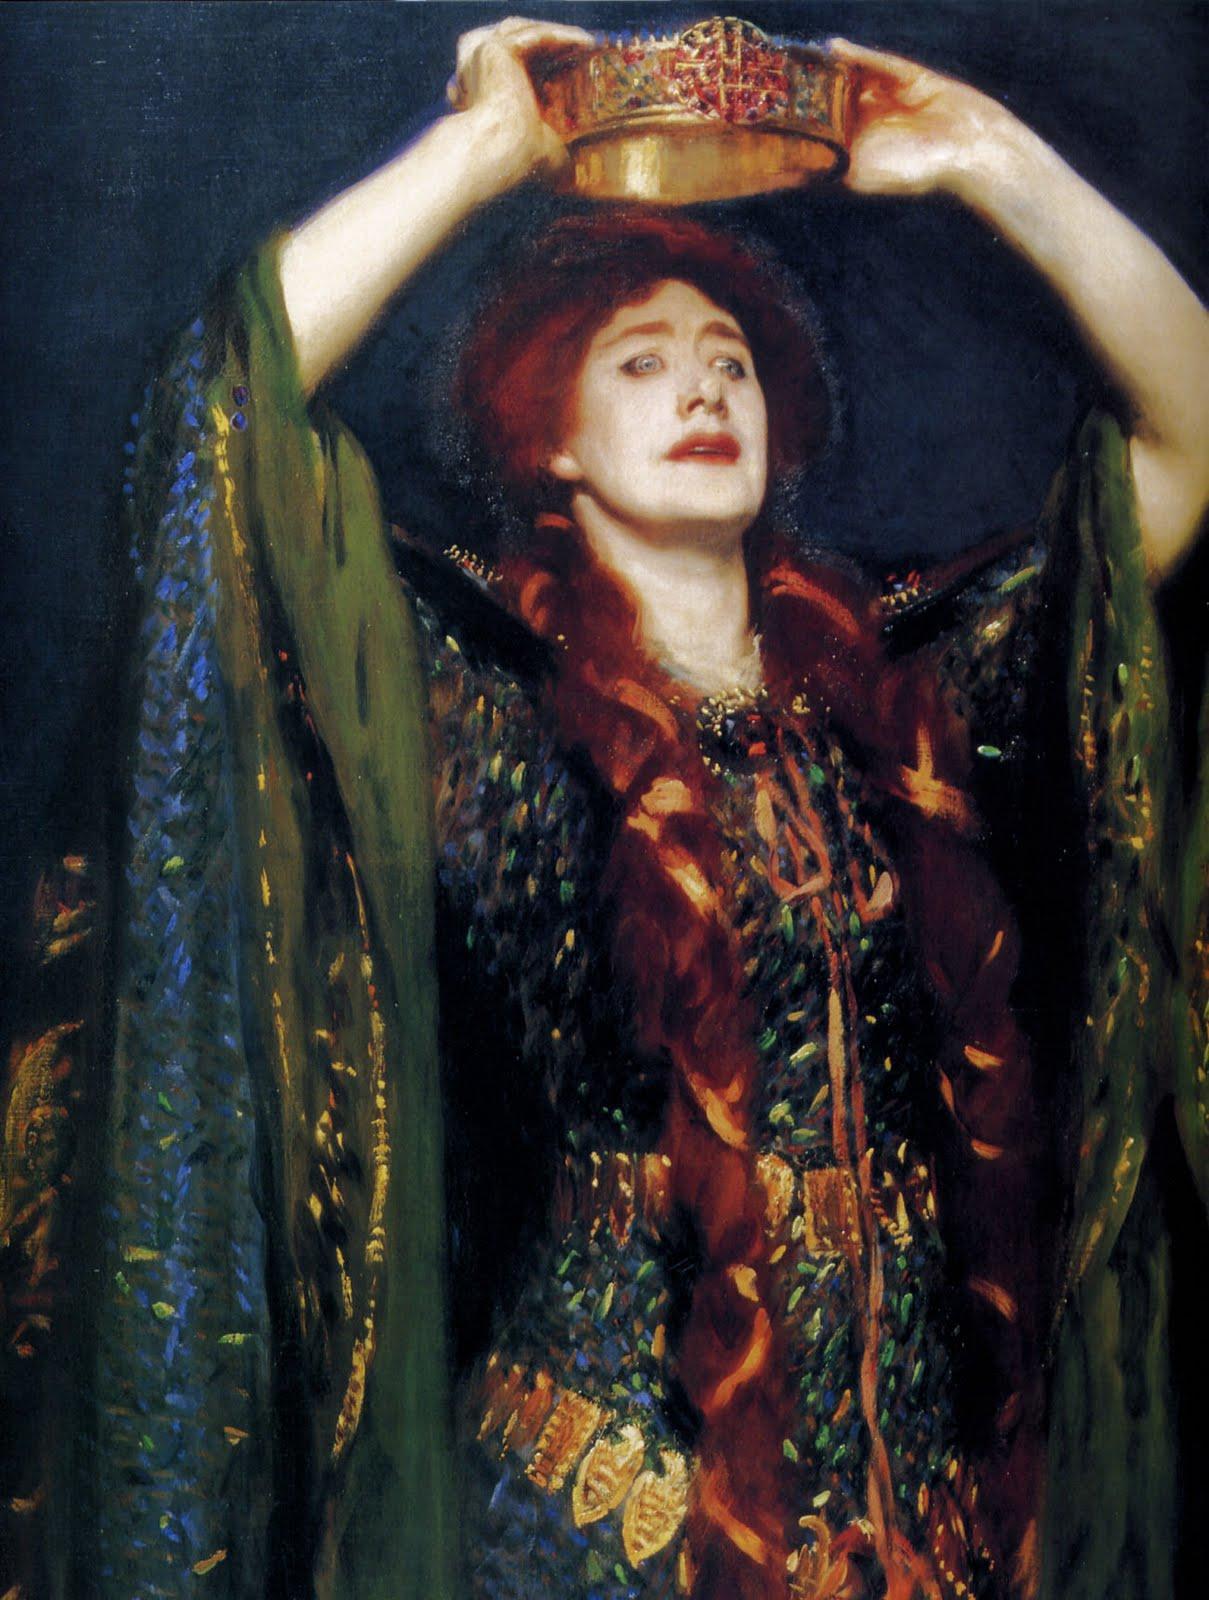 Classic Art Blog: John Singer Sargent (1856-1925)